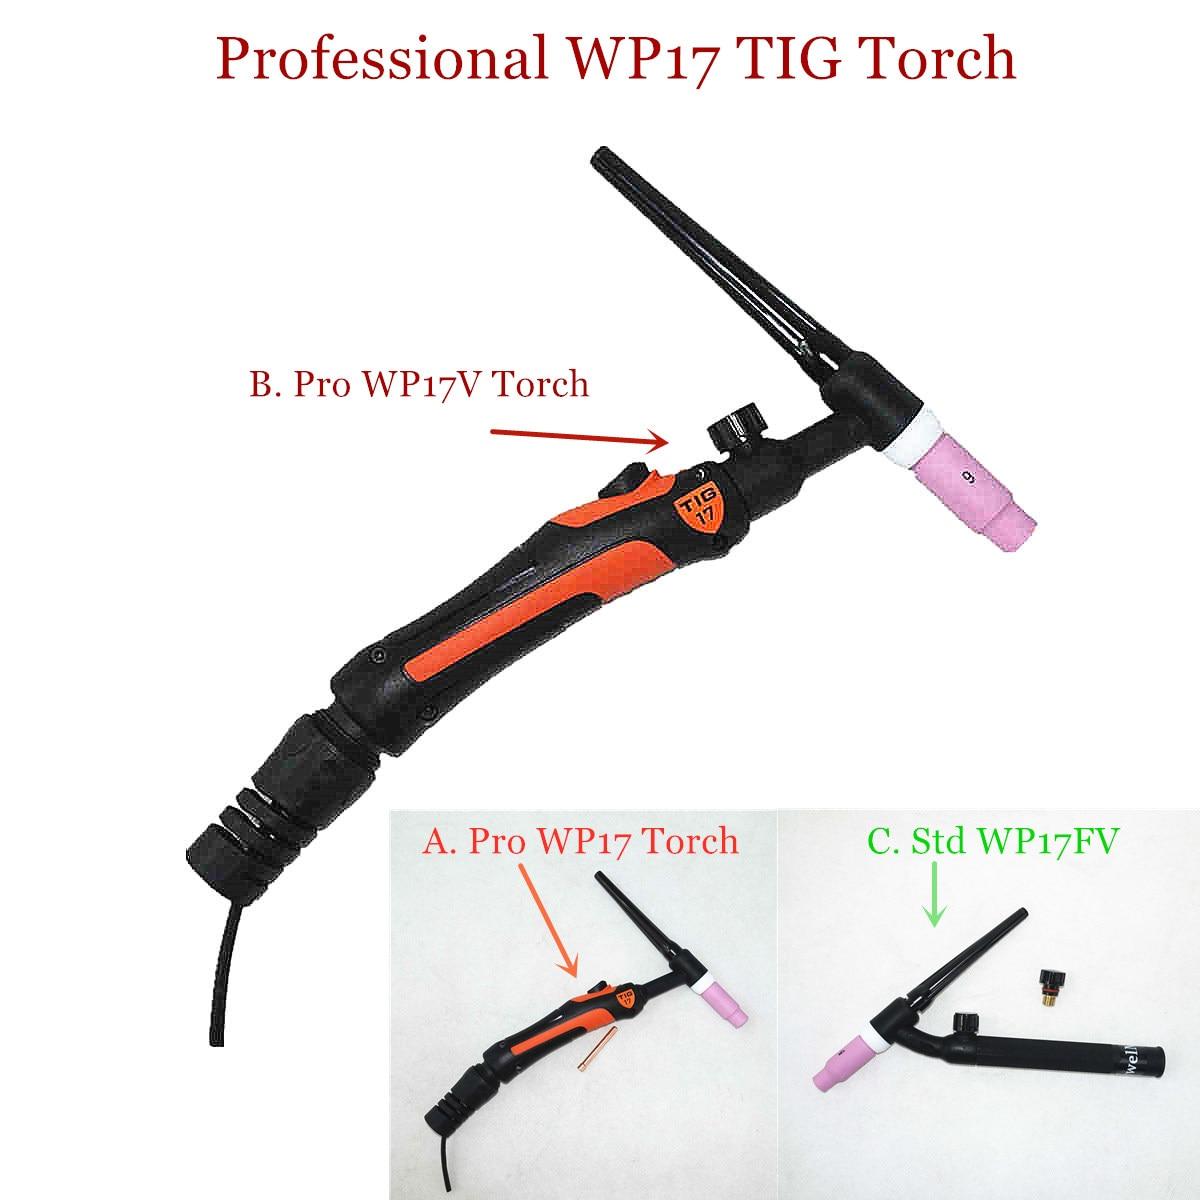 Professional WP17 TIG Torch 150A GTAW Gas Tungsten Welding Gun Argon Air Cooled WP17V Gas Valve W7FV Flexible TIG Welding Torch